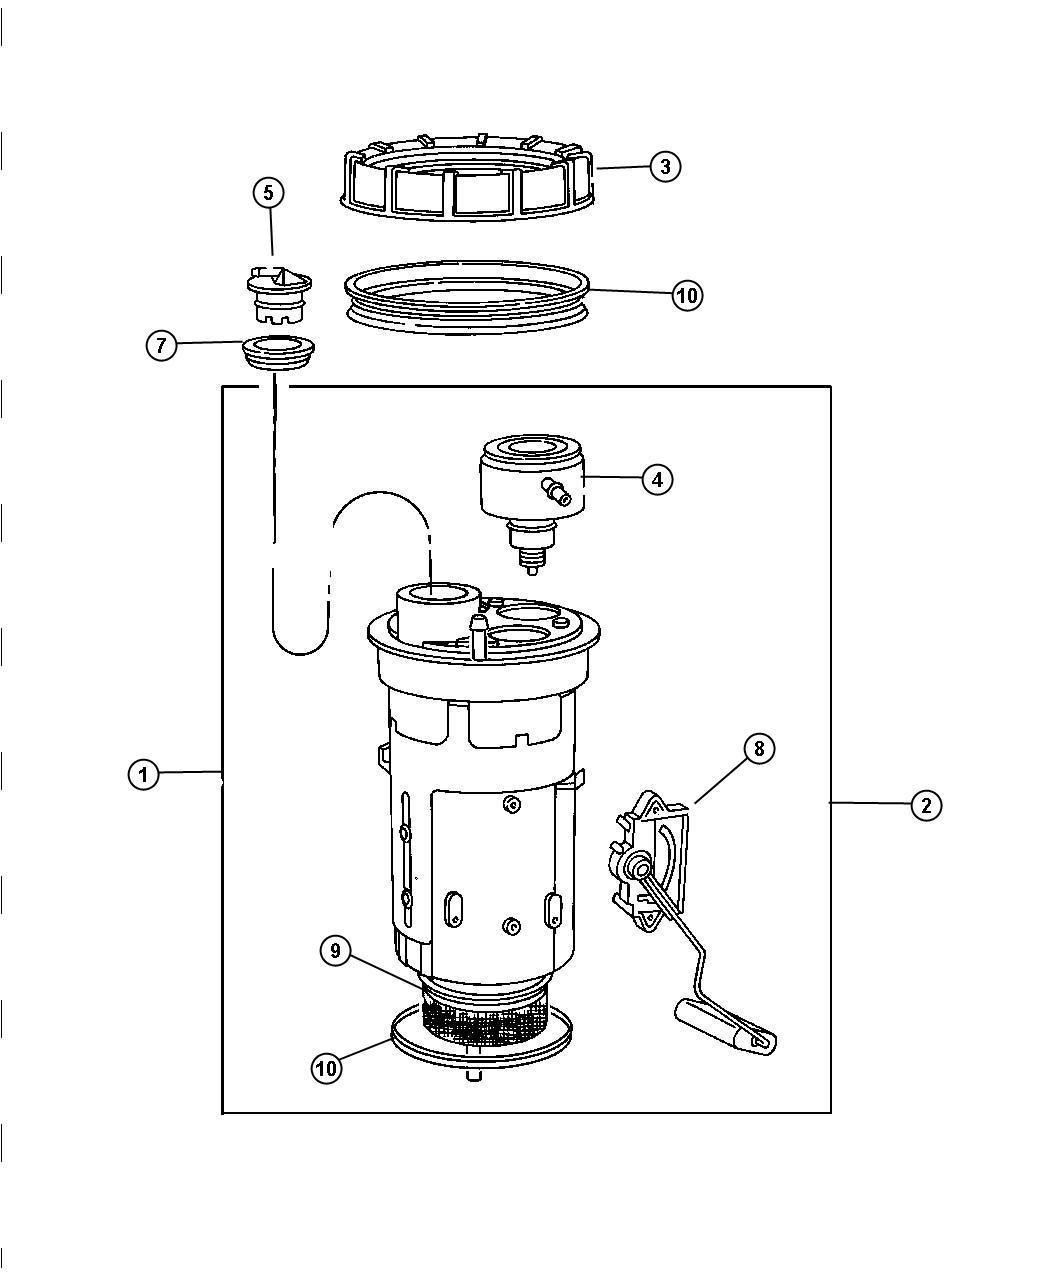 Diesel Engine Diagram Fuel Tank Condensation: Dodge Valve. Fuel Tank Rollover Safety